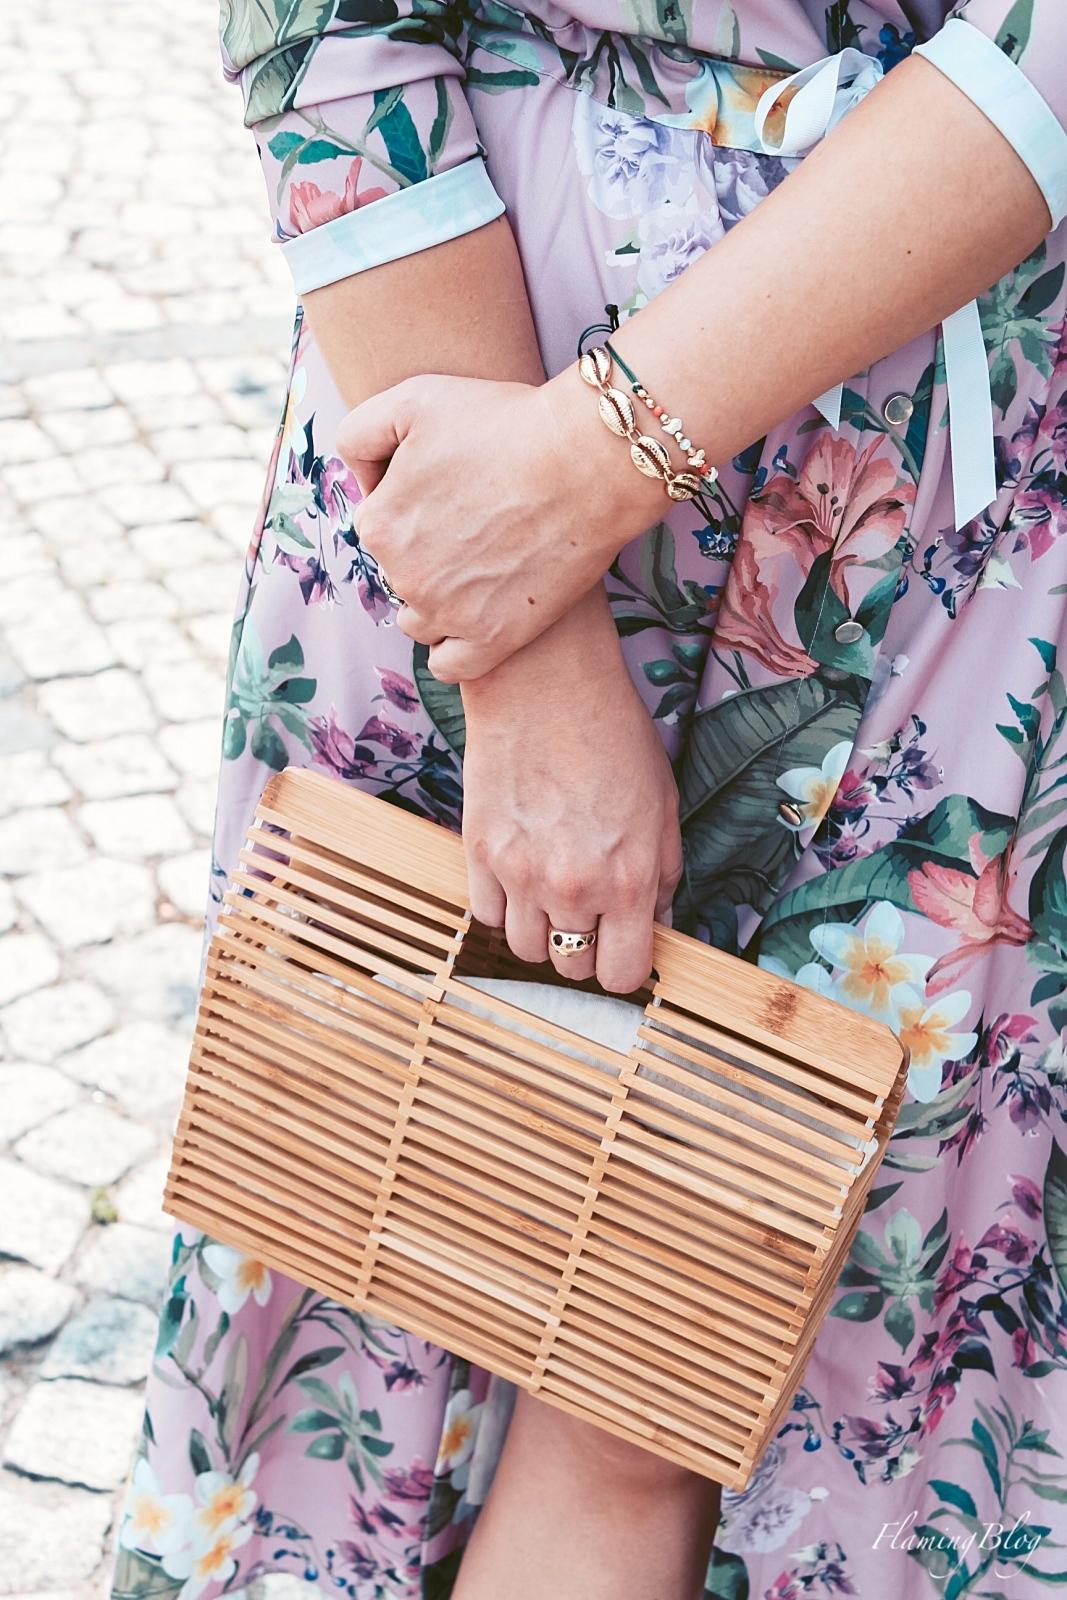 modne torebki-kosze plecione worki trendy lato 2020